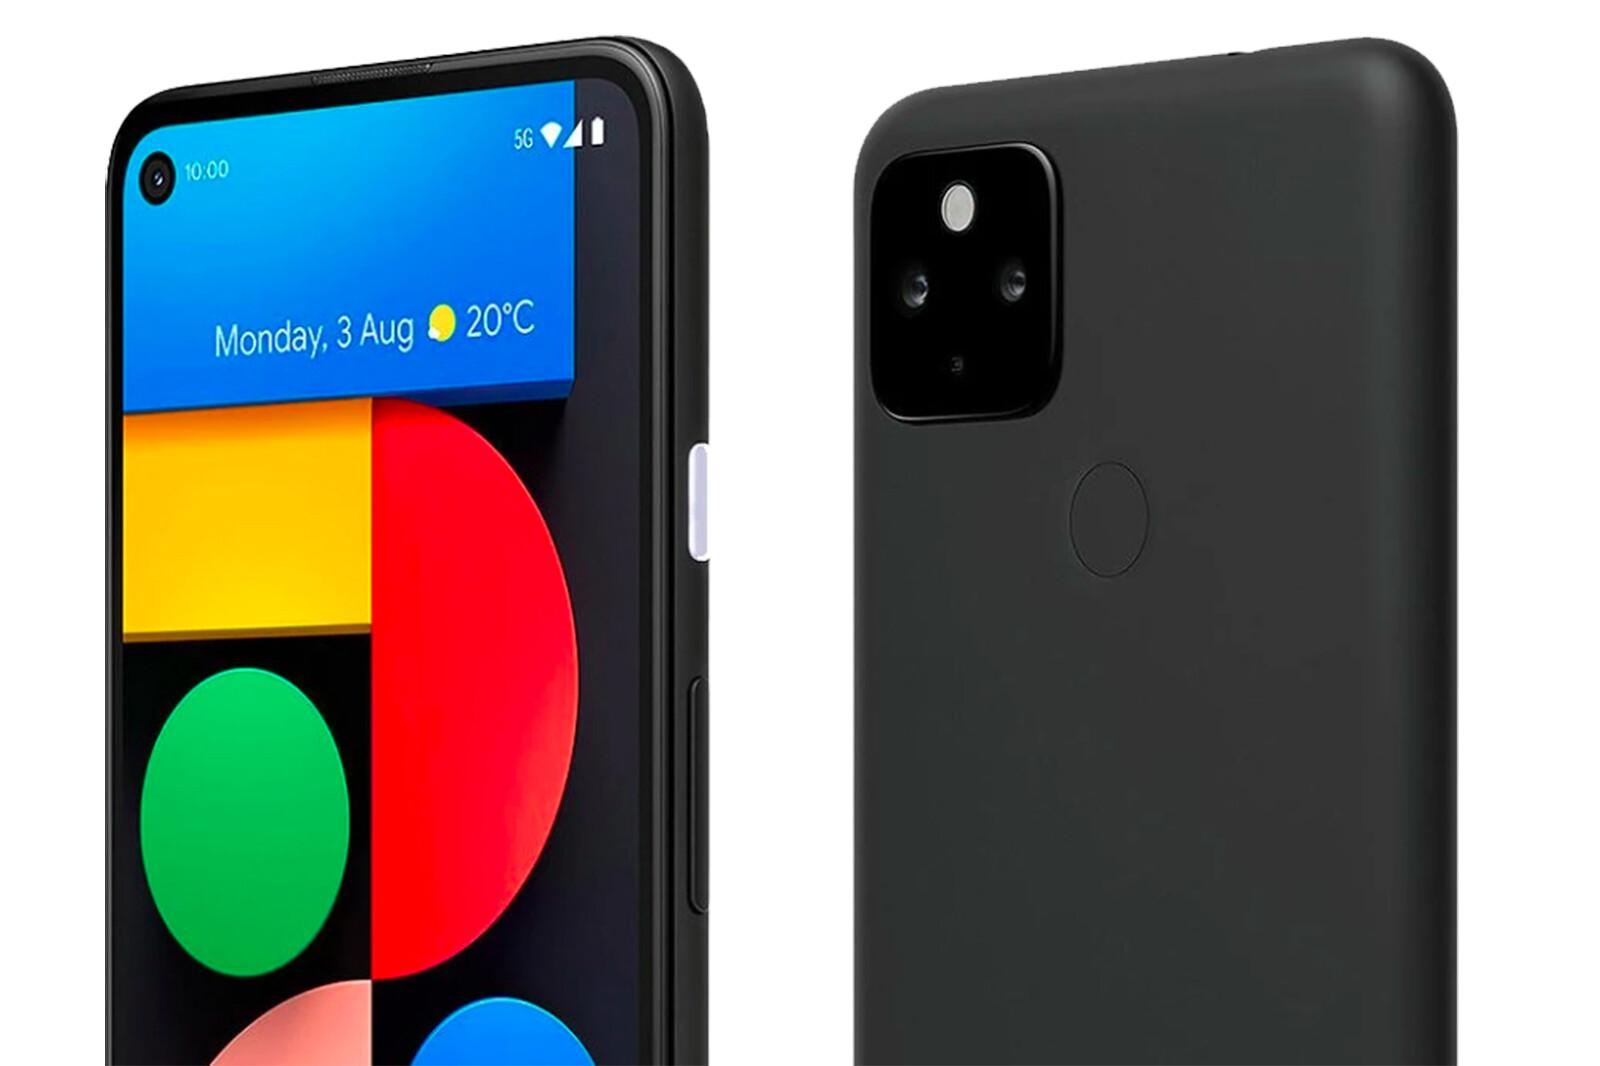 Google Pixel 4a 5G vs Google Pixel 4a